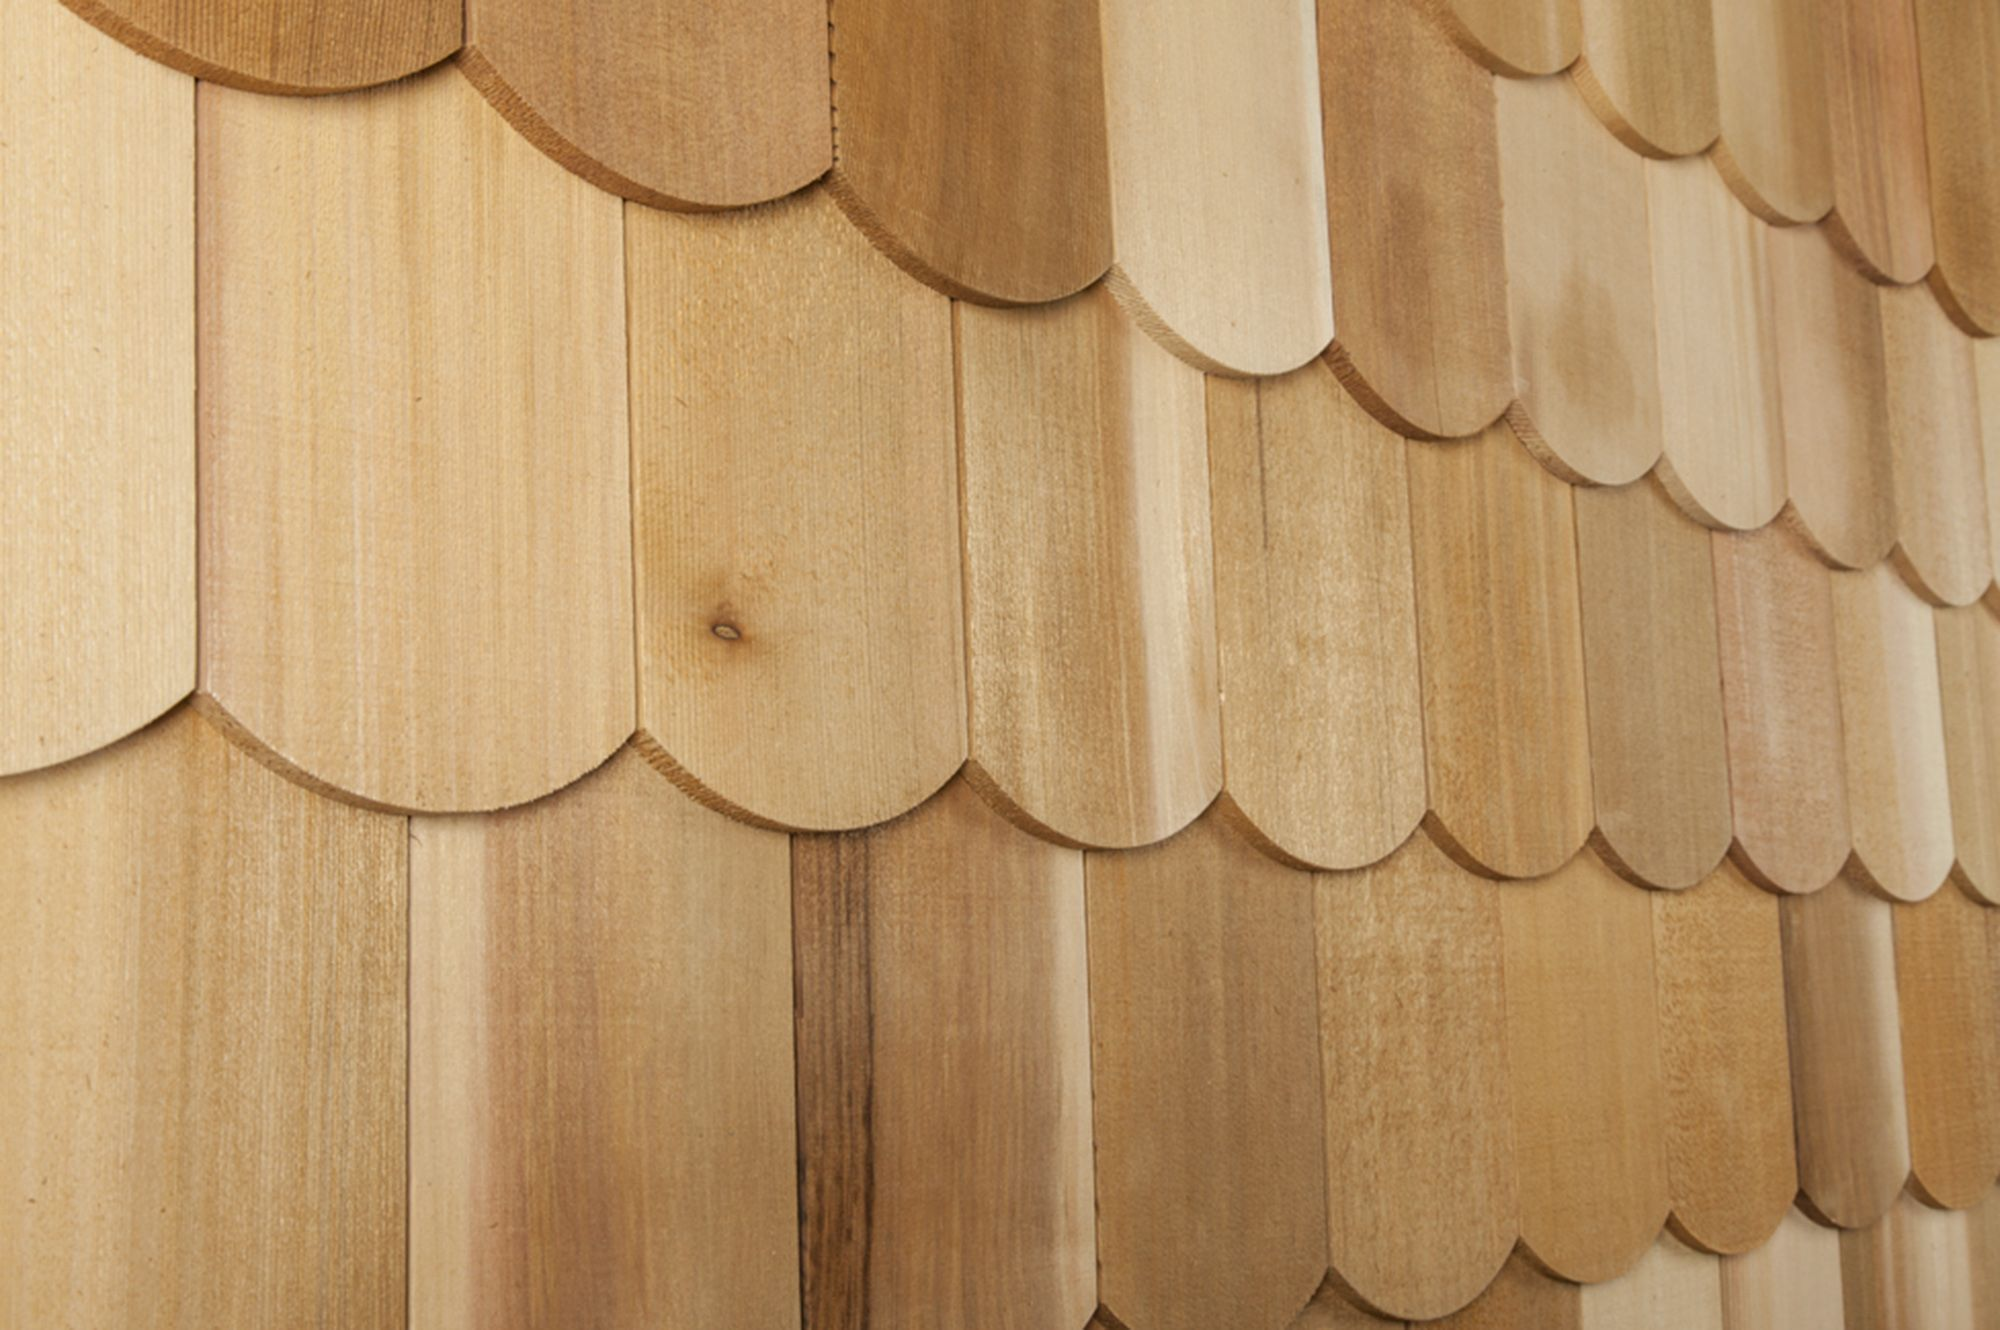 Cedar Decorator Shingles Wide Fishscale 4 15 16 X 17 1 2 Shingle Siding Wood Roof Wood Siding